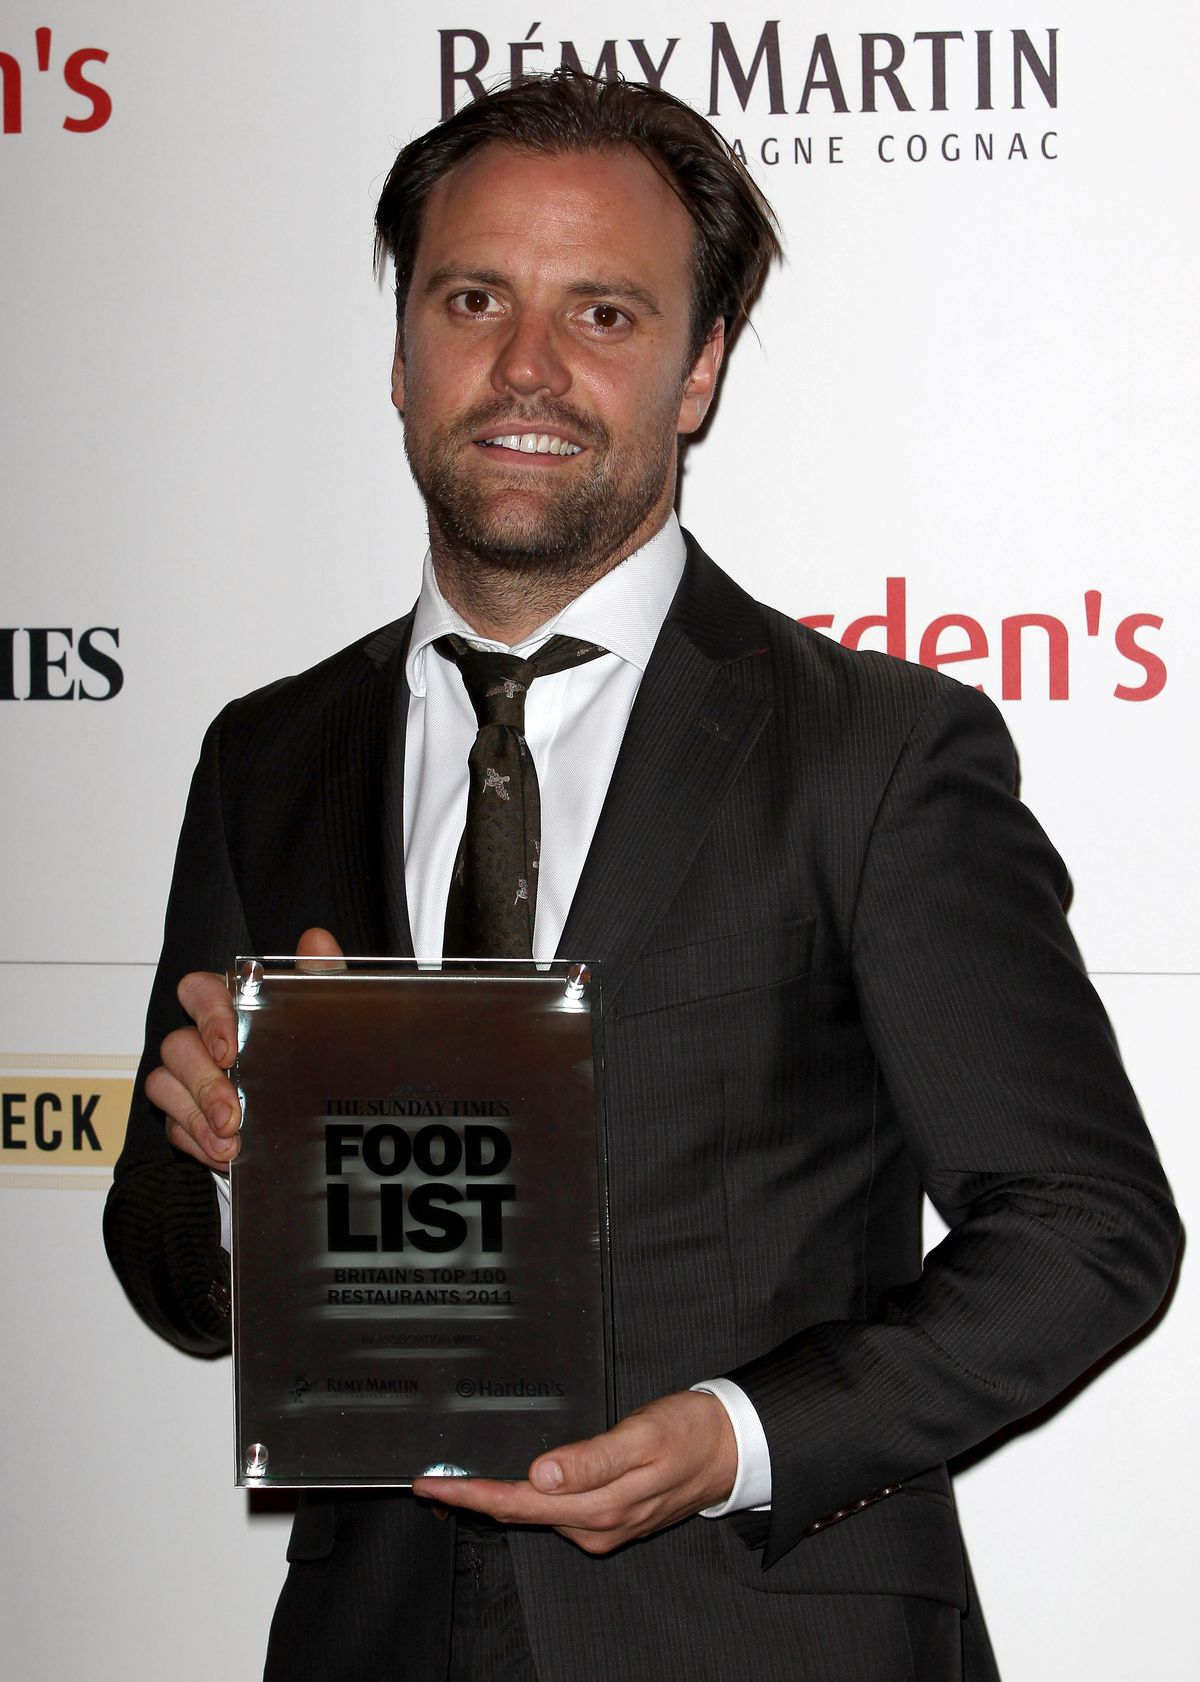 UK's Top 100 Restaurant Awards 2011